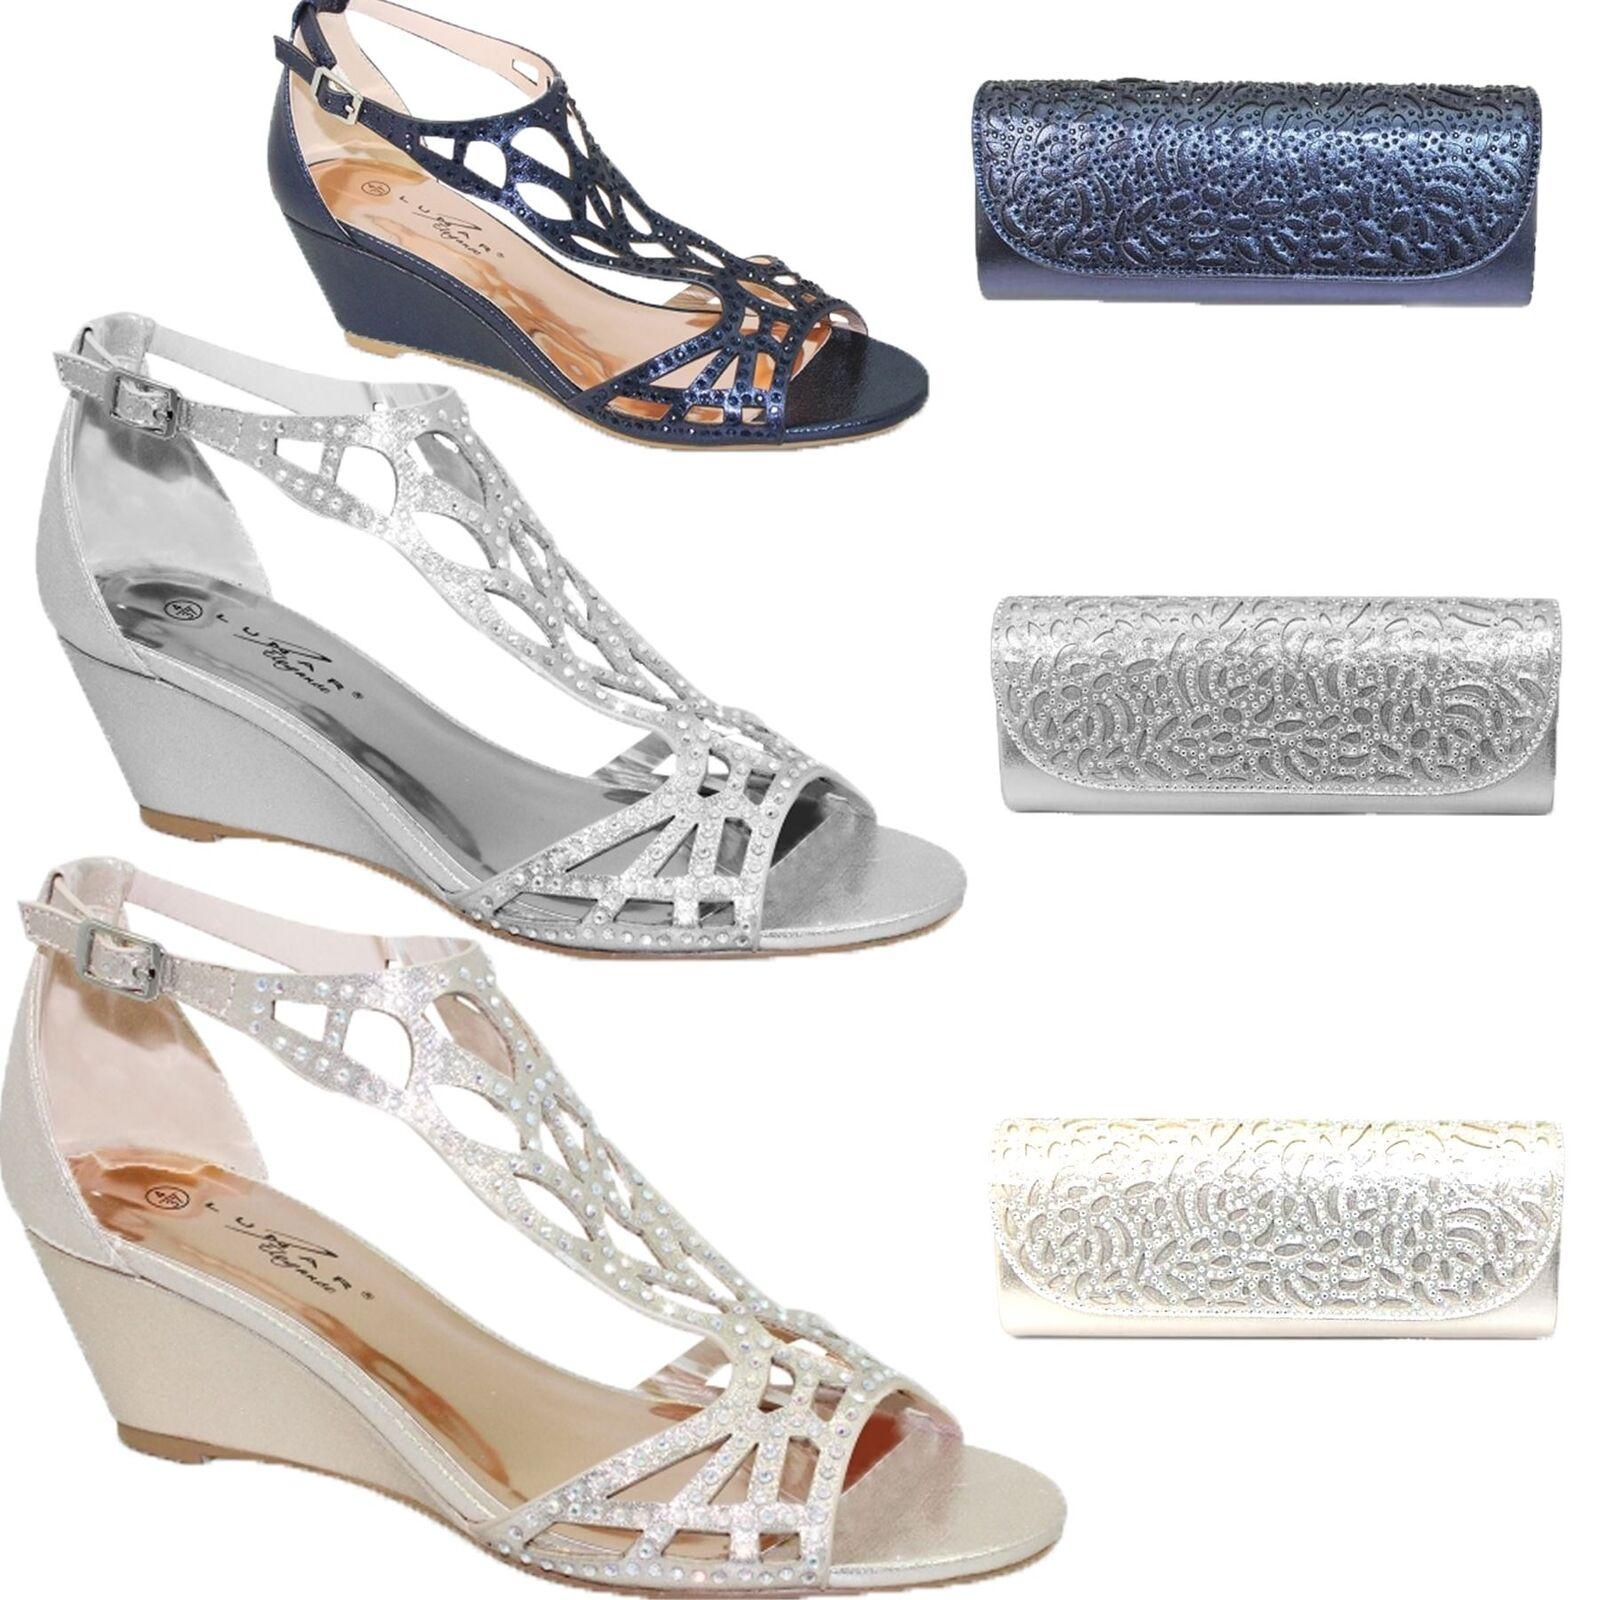 FLC111 Denton Rhinestone Strap Diamante Peep Toe Wedge Sandale Clutch Bag